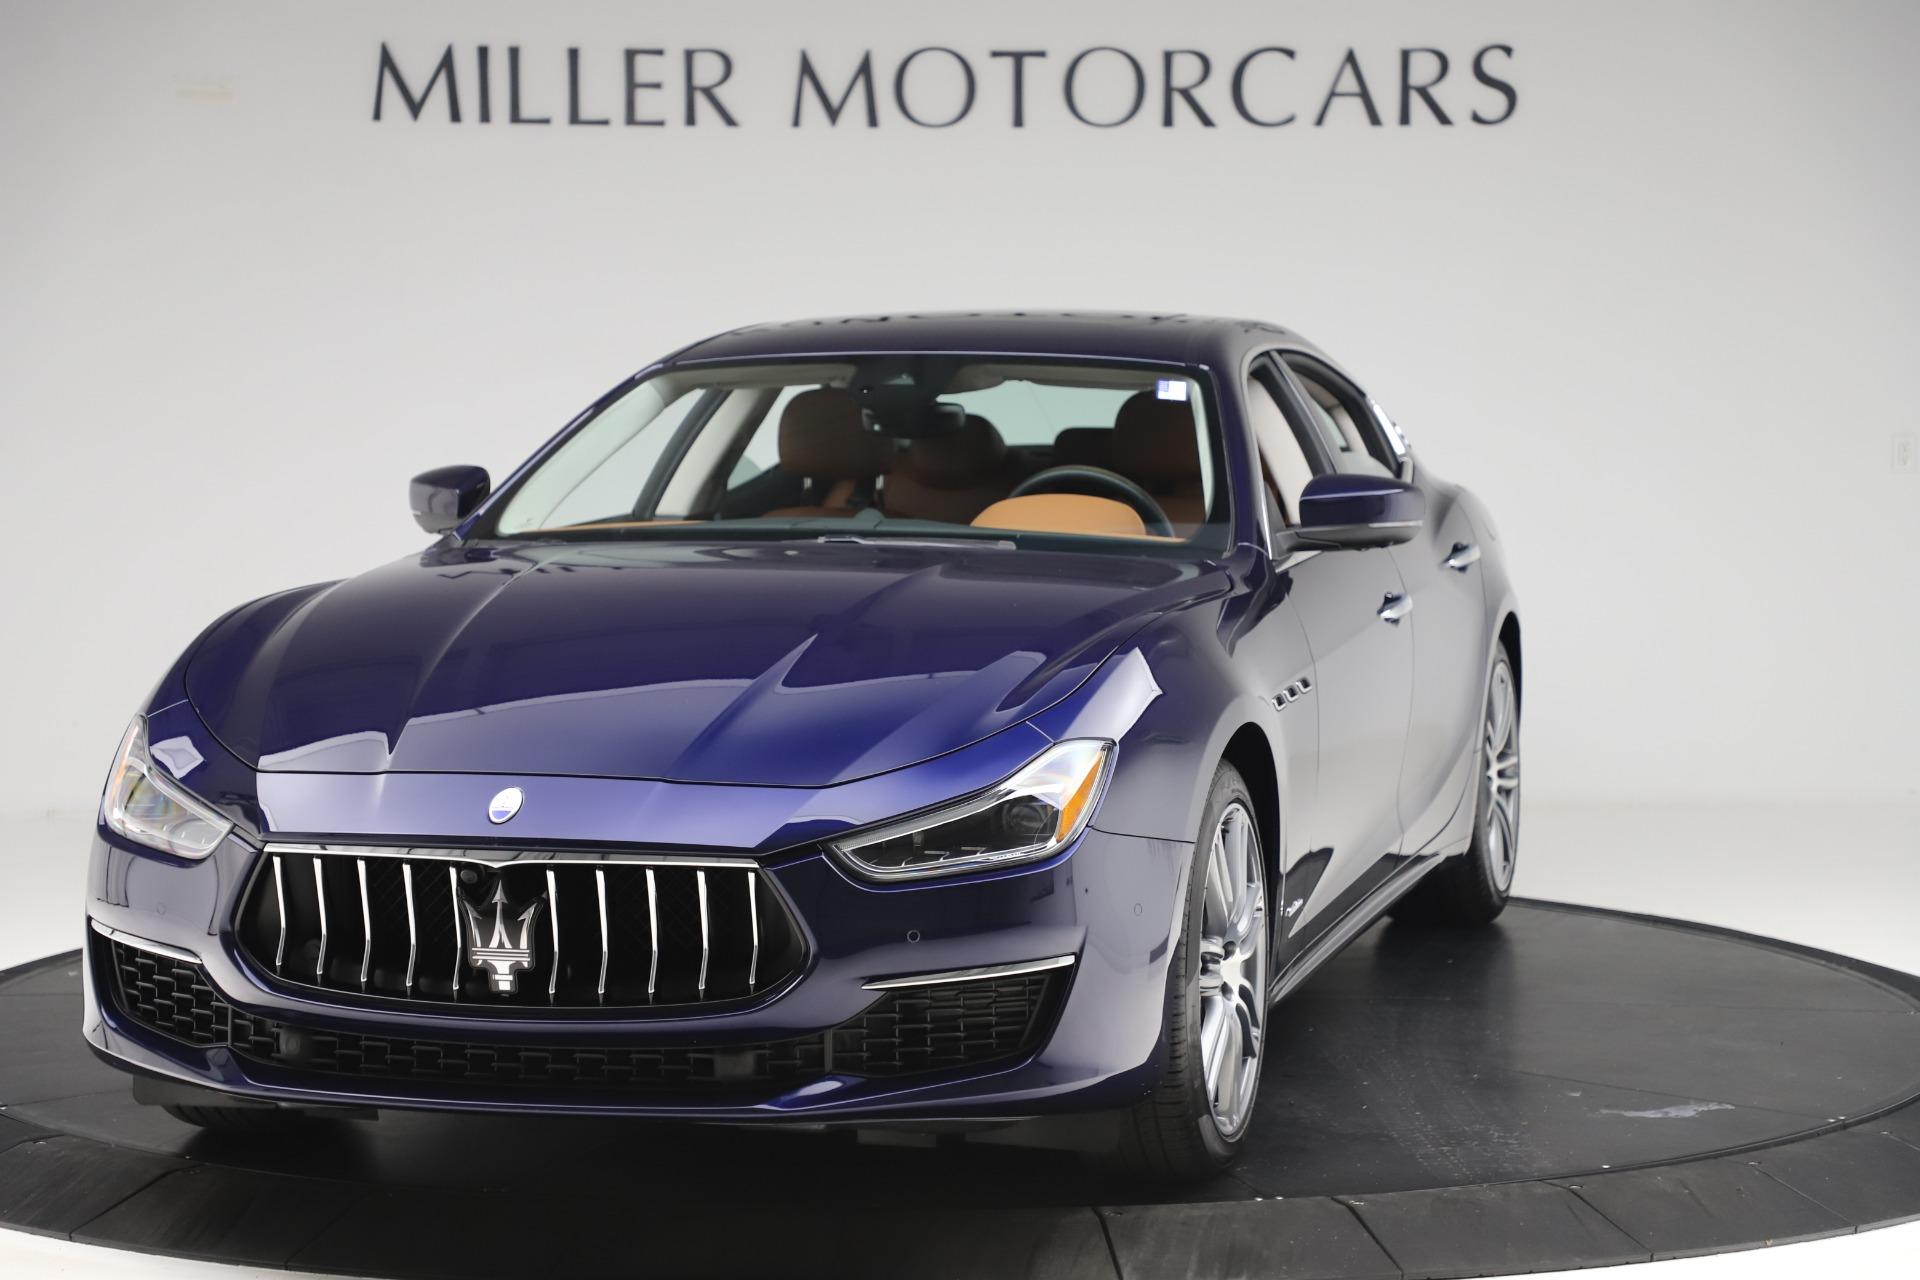 New 2020 Maserati Ghibli S Q4 GranLusso for sale $89,535 at Aston Martin of Greenwich in Greenwich CT 06830 1